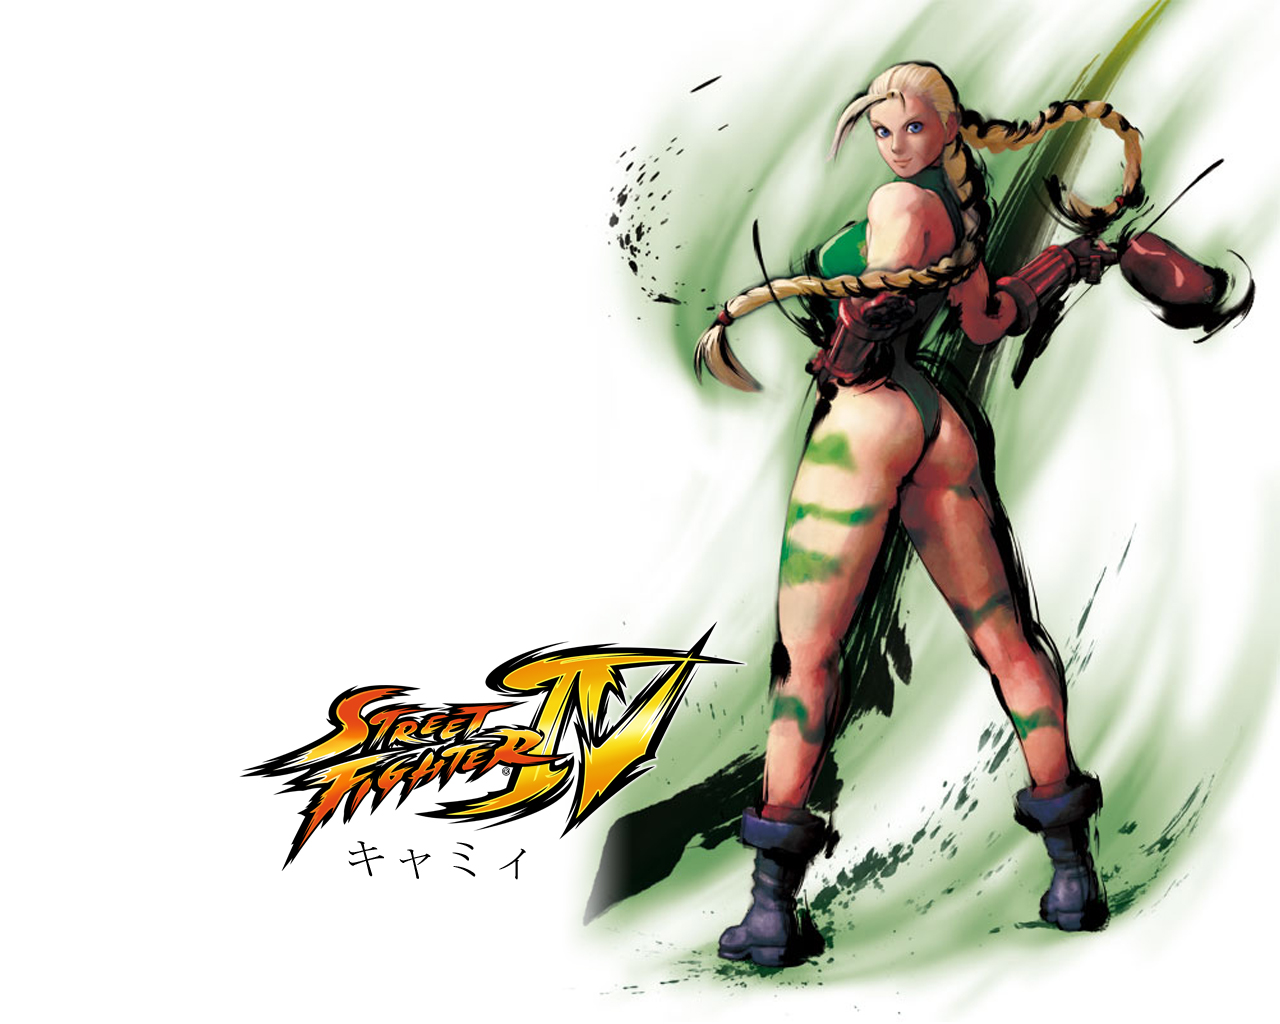 Street Fighter 4 Cammy Wallpaper   Customity